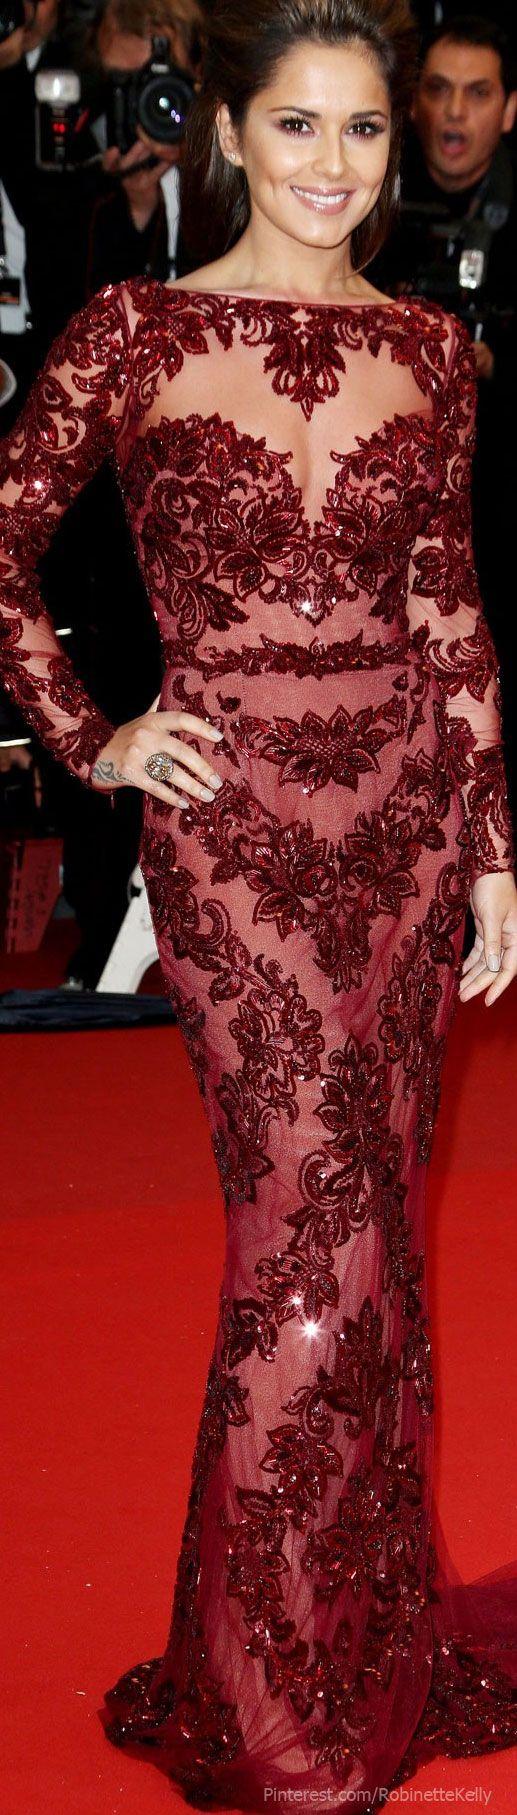 Rosamaria G Frangini   Burgundy Desire    VIPBlackOrchidClub   Cheryl Cole, Zuhair Murad Burgundy* Dress   Cannes Film Festival LBV